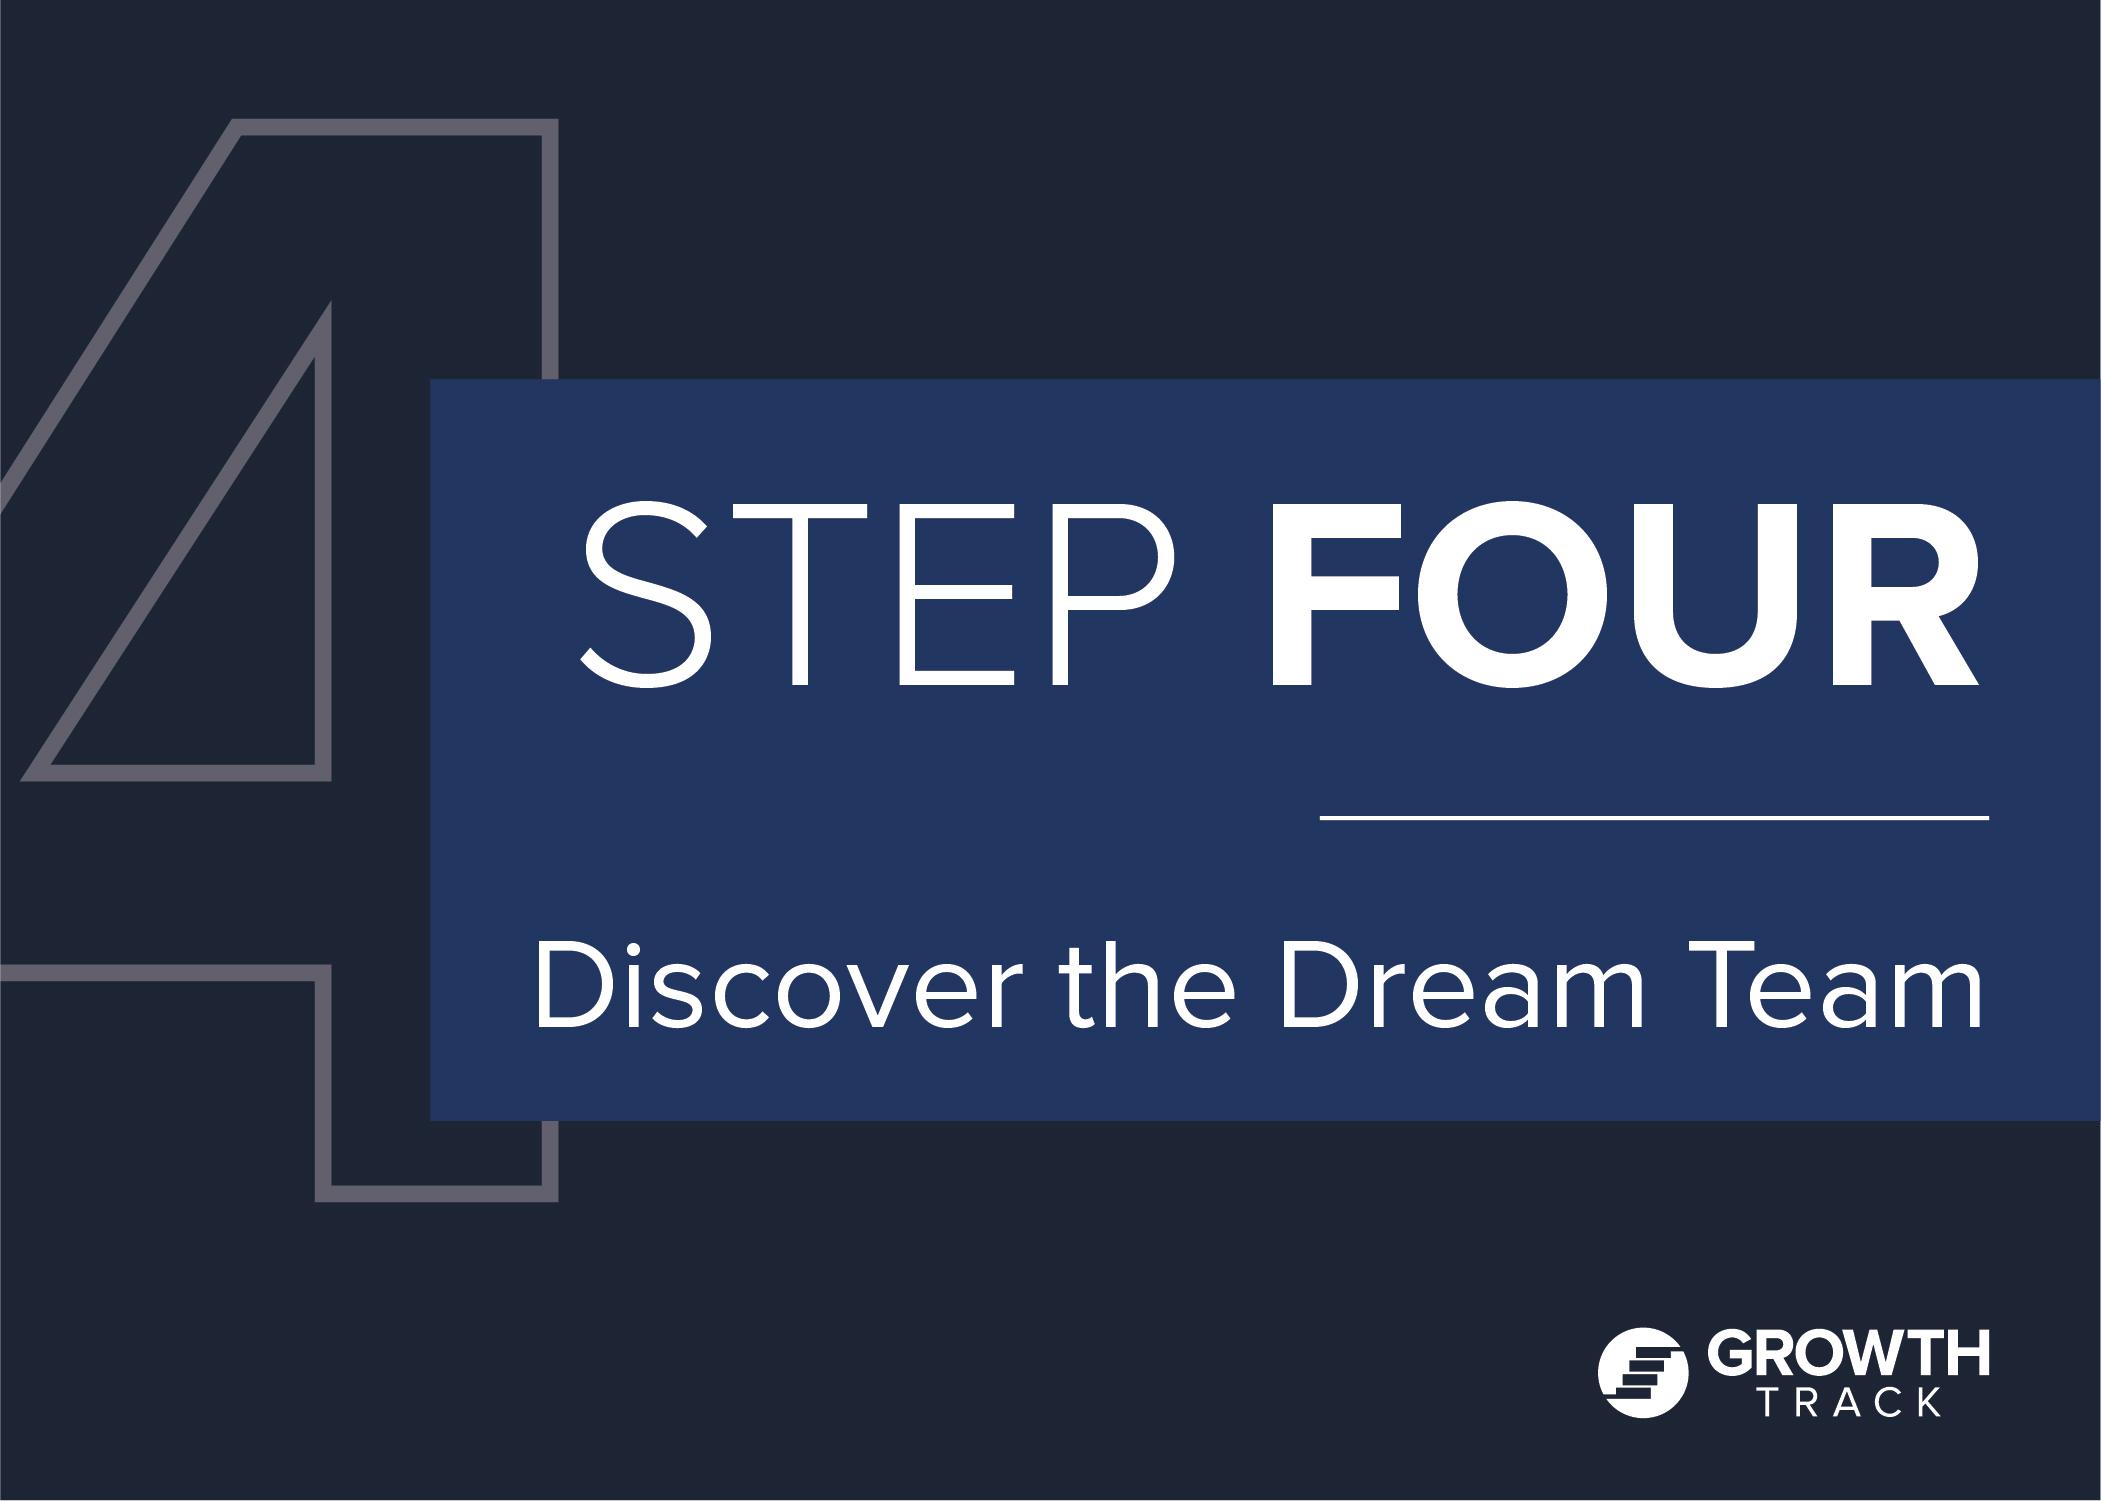 step four_7x5.jpg